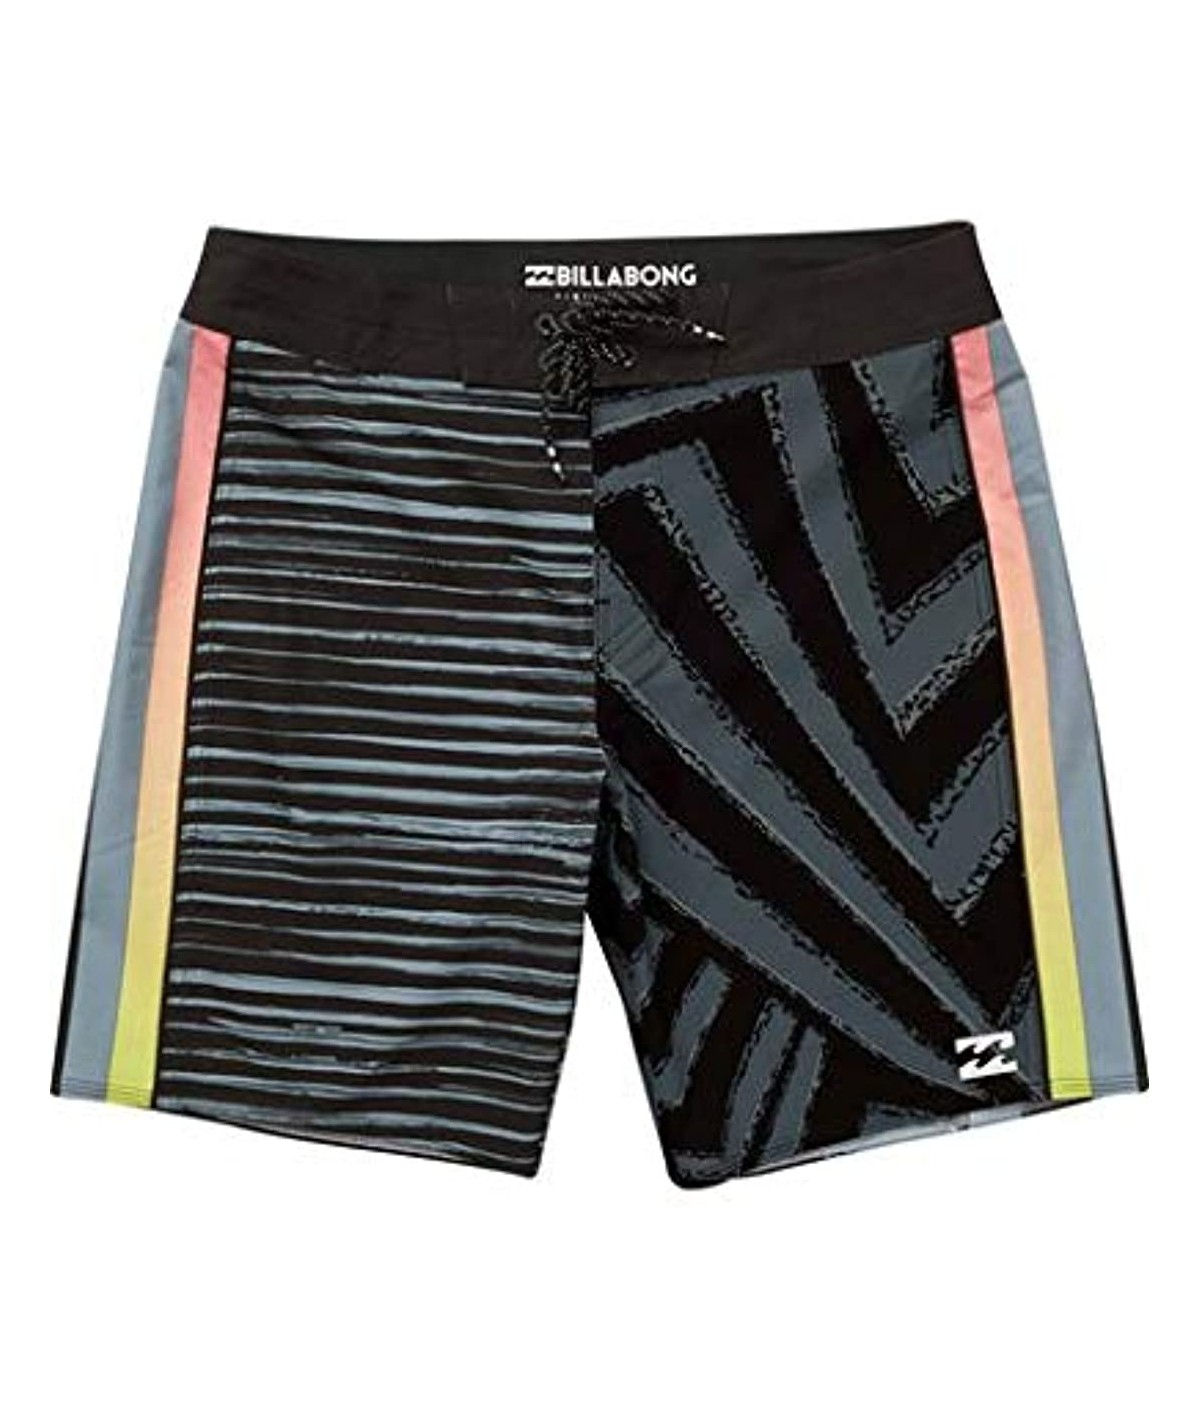 Desert Army Digital camo Grey Cargo Fully Lined Side Split Swimming Trunks Shorts